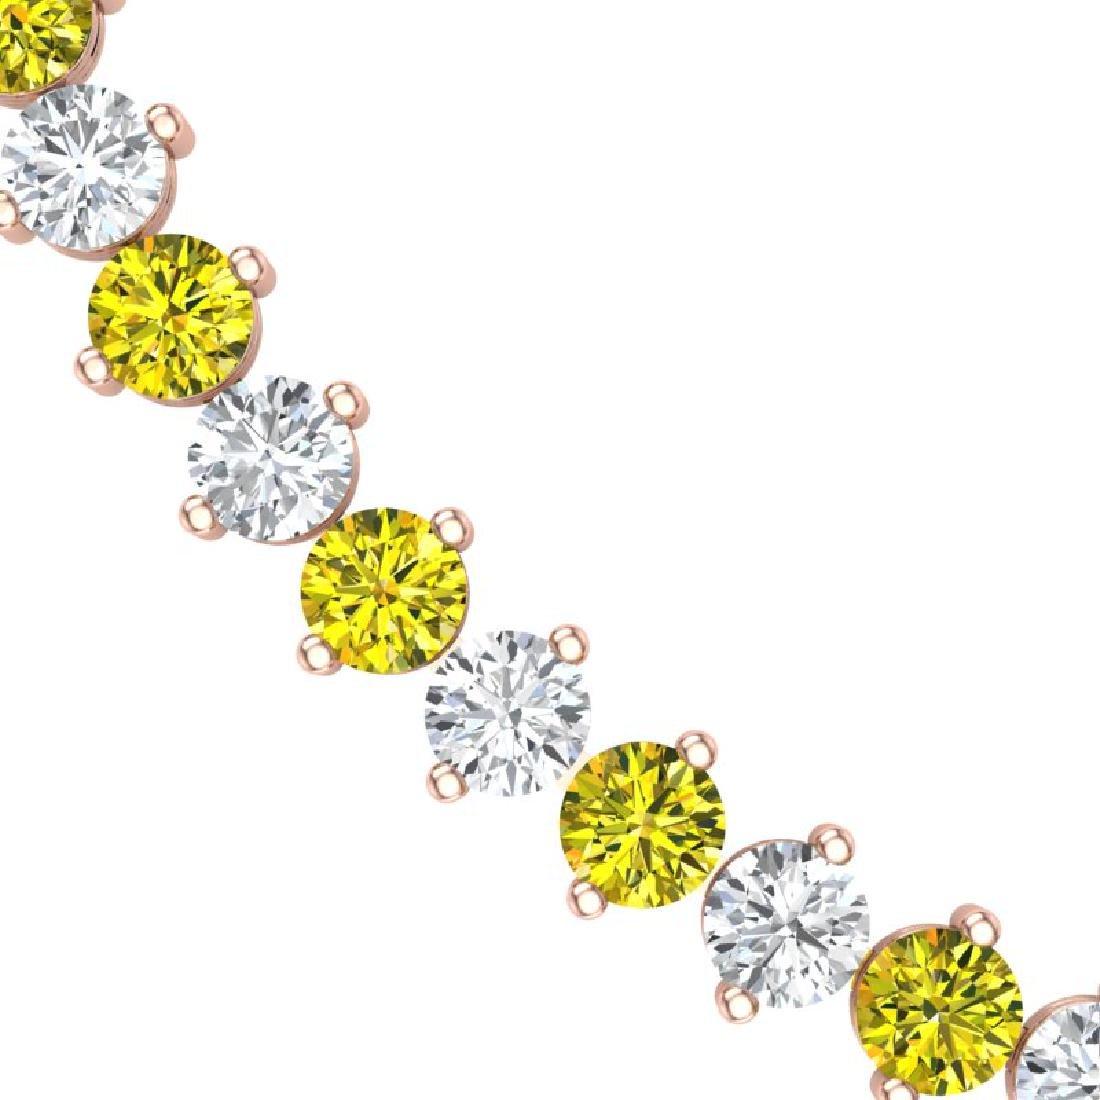 45 CTW SI/I Fancy Yellow & White Diamond Necklace 18K